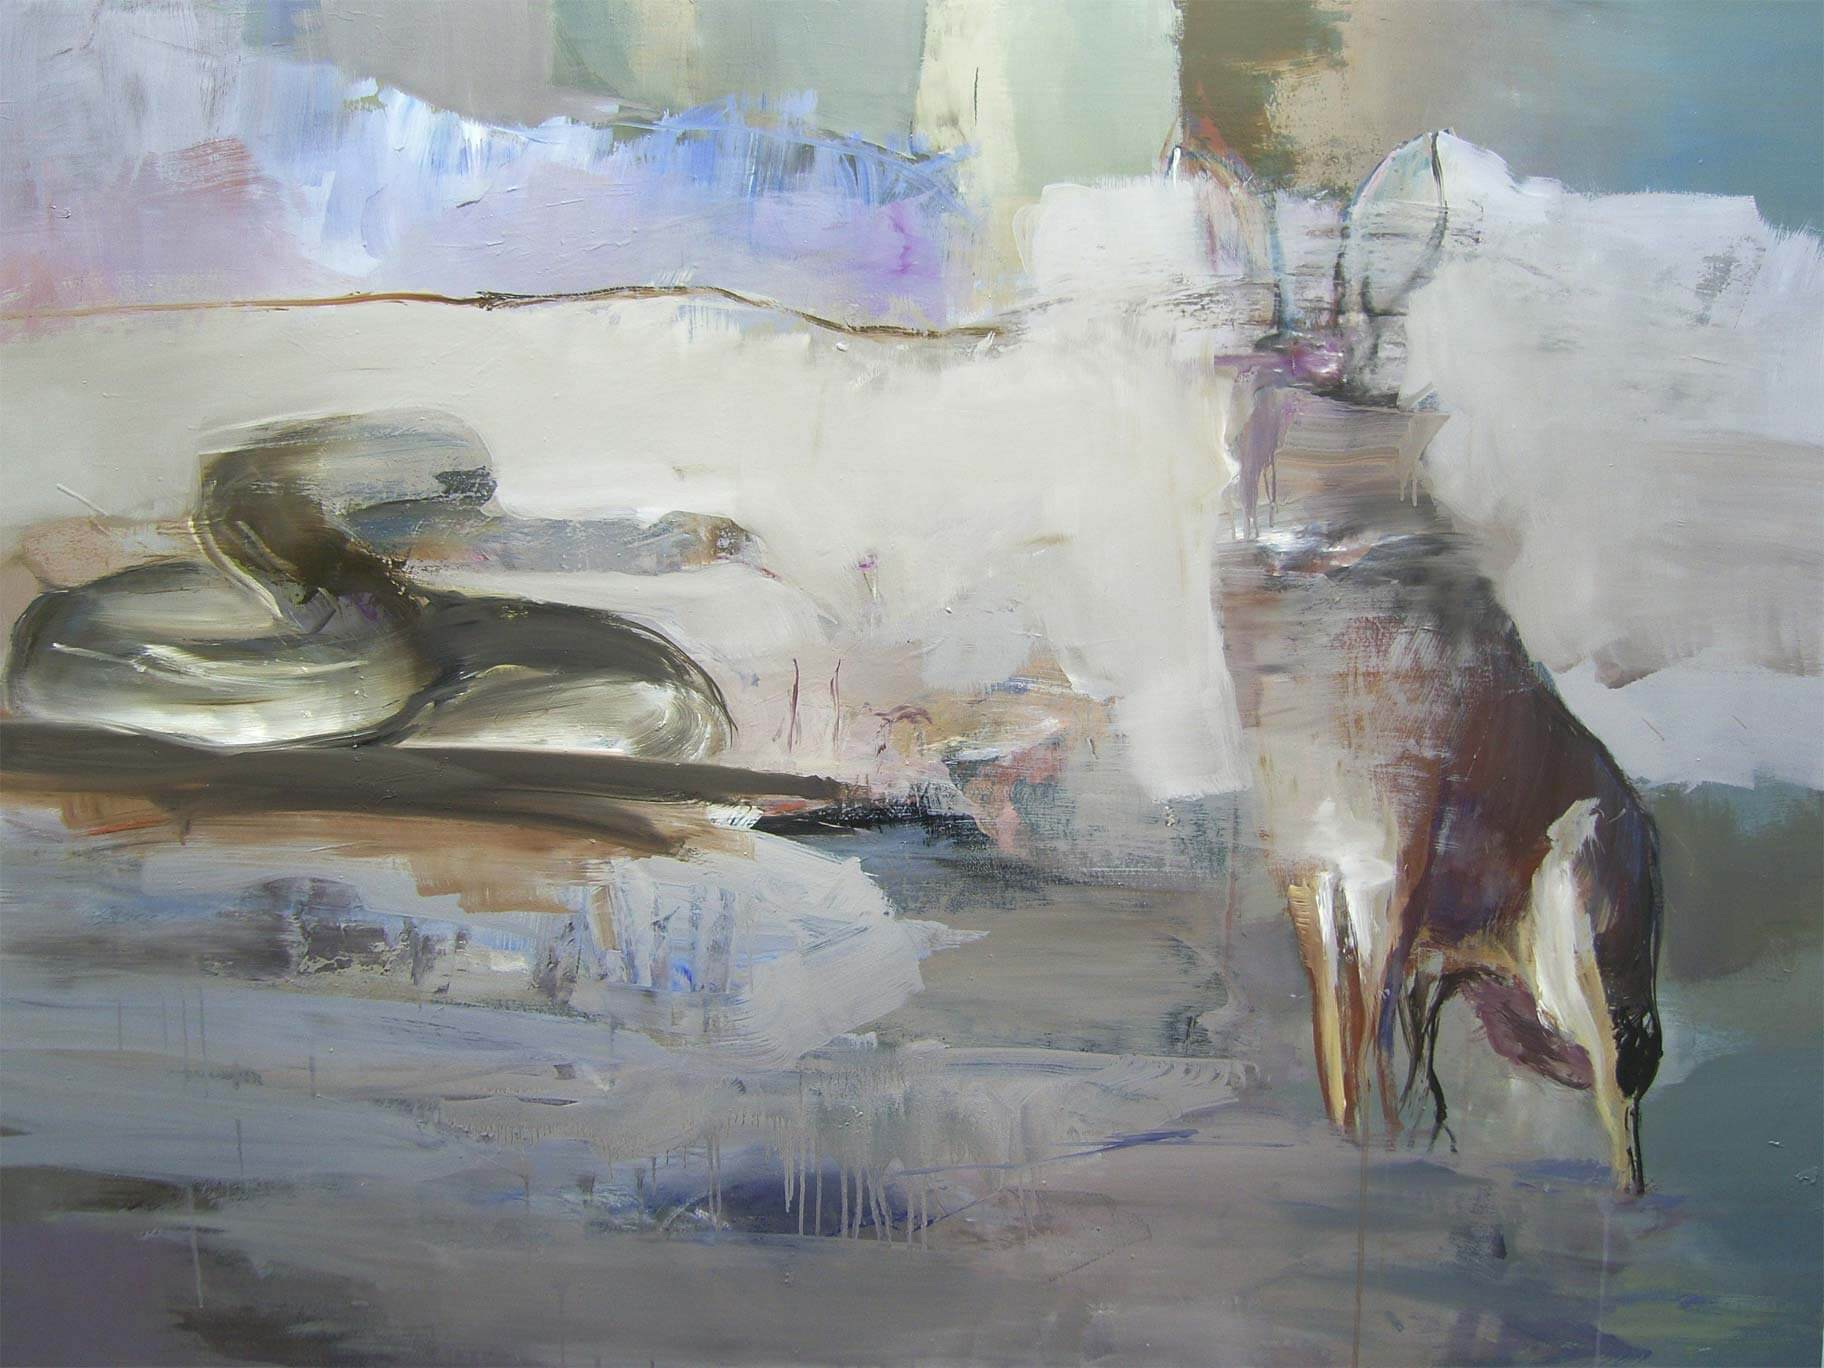 Second interaction between rabbit jack, snake plissken and the primal garden, 2016, olio su tela, 120x150 cm